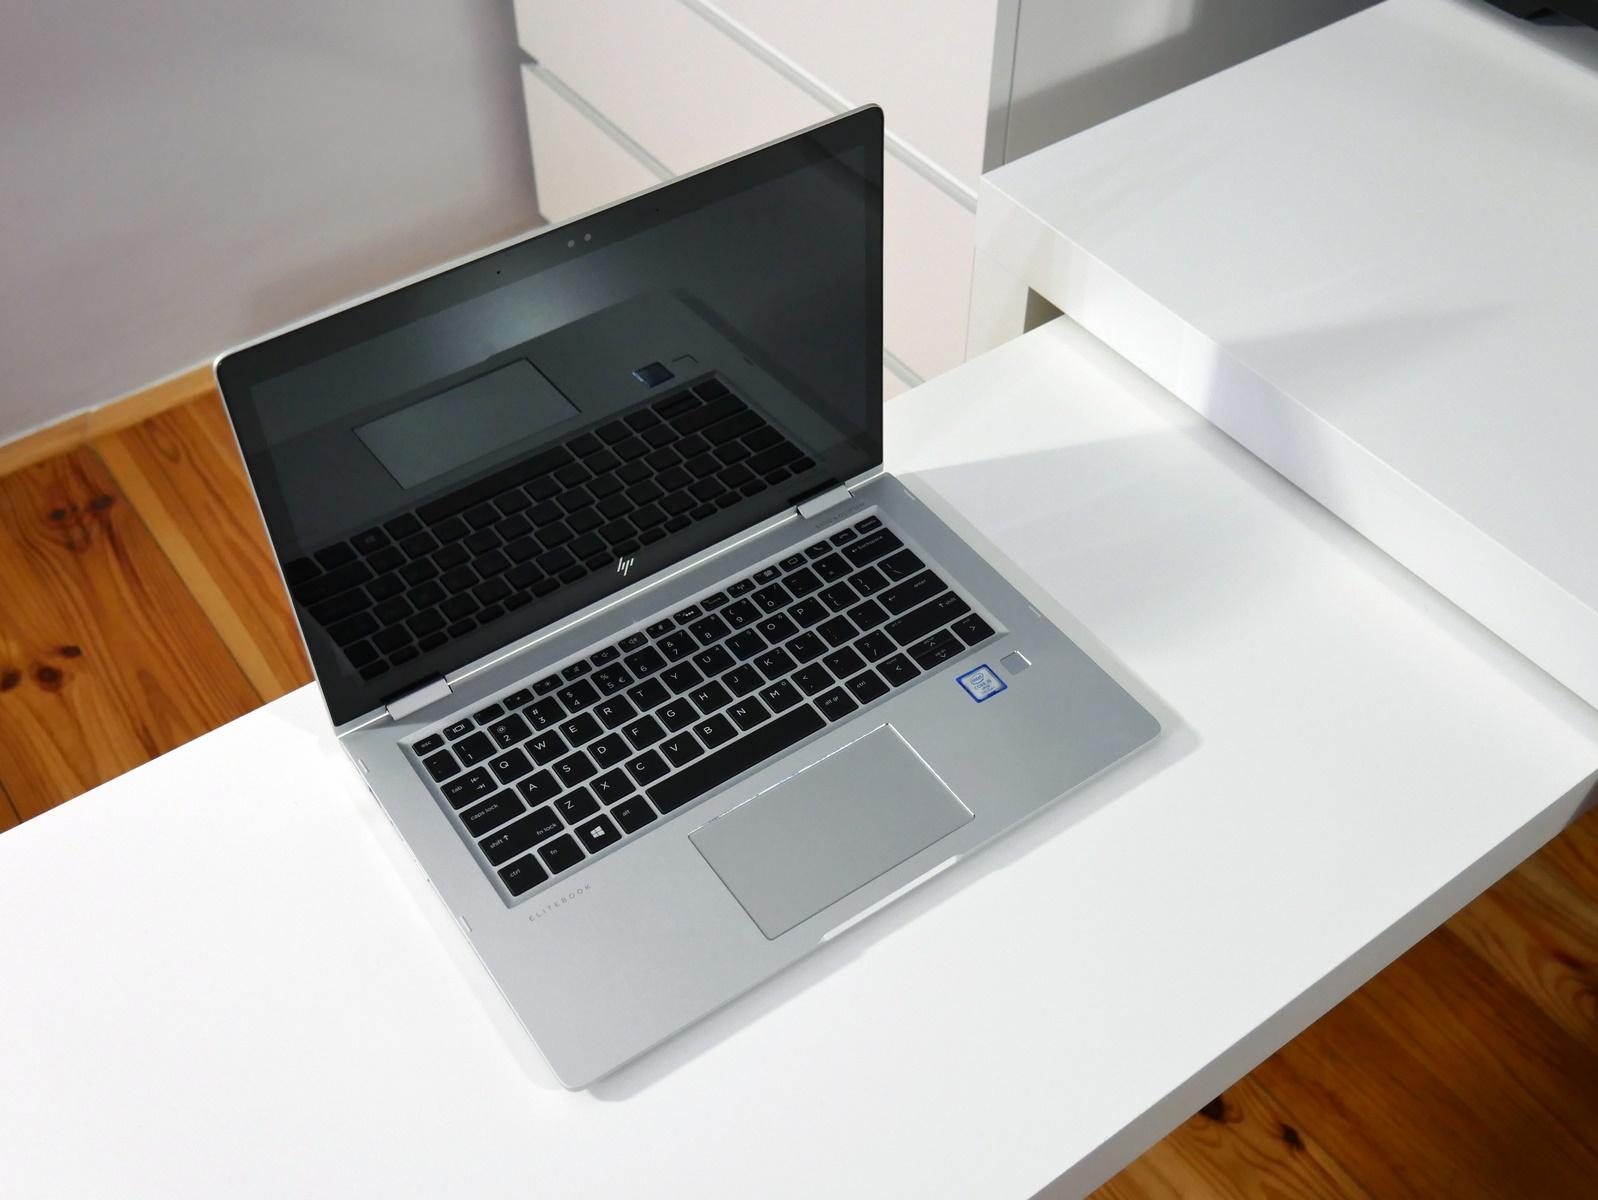 hp-elitebook-x360-1020-g2-recenzja-09